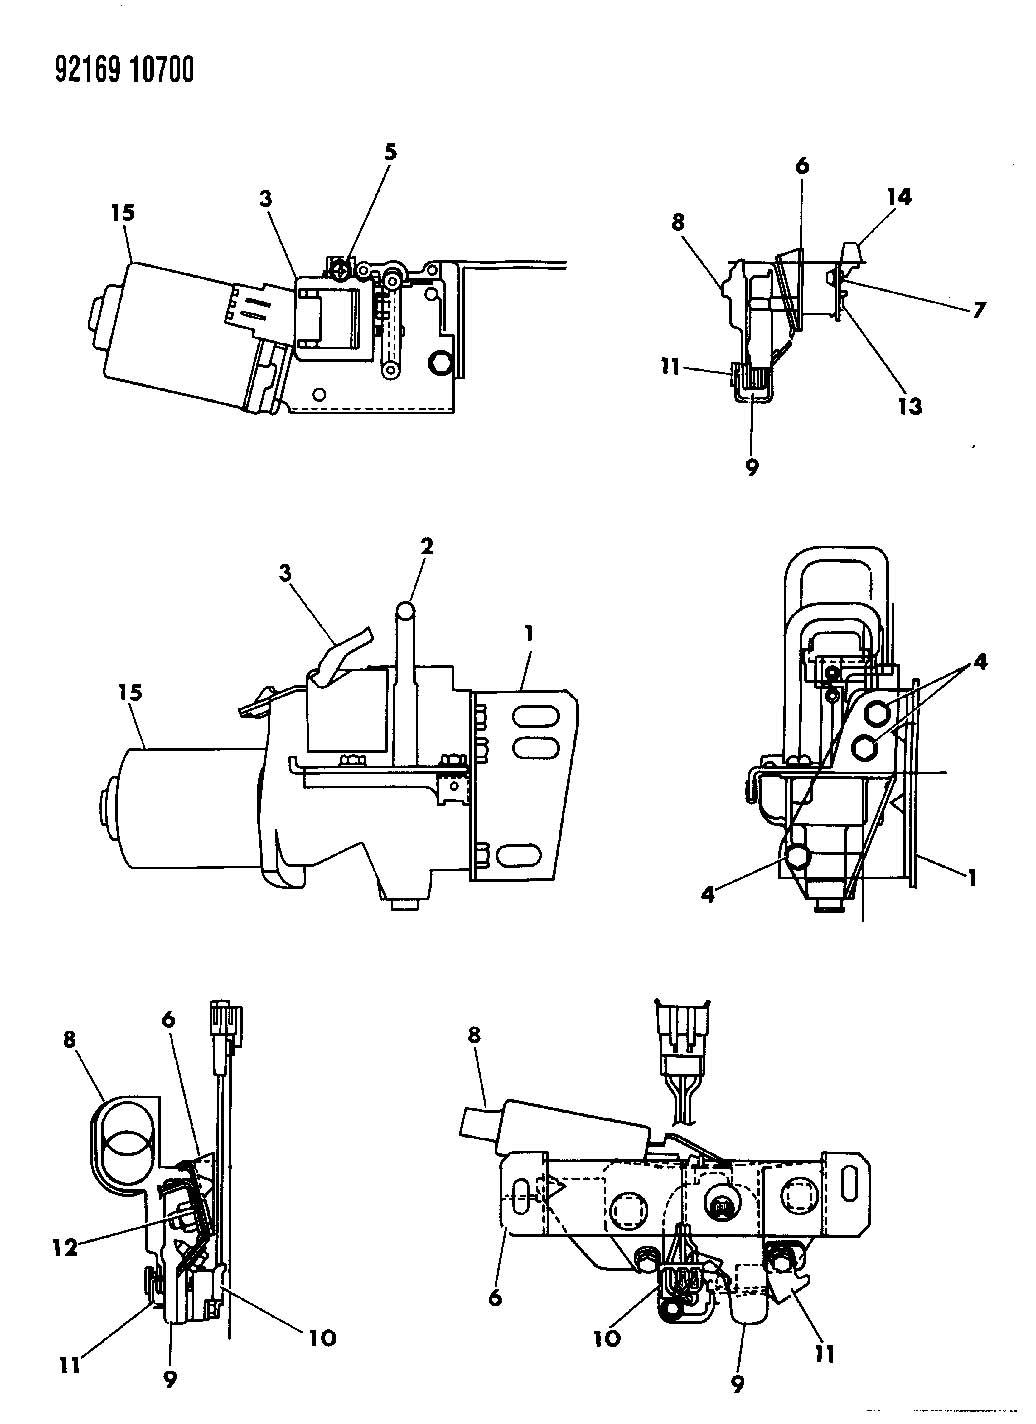 Service manual [Service Manuals Schematics 1992 Dodge